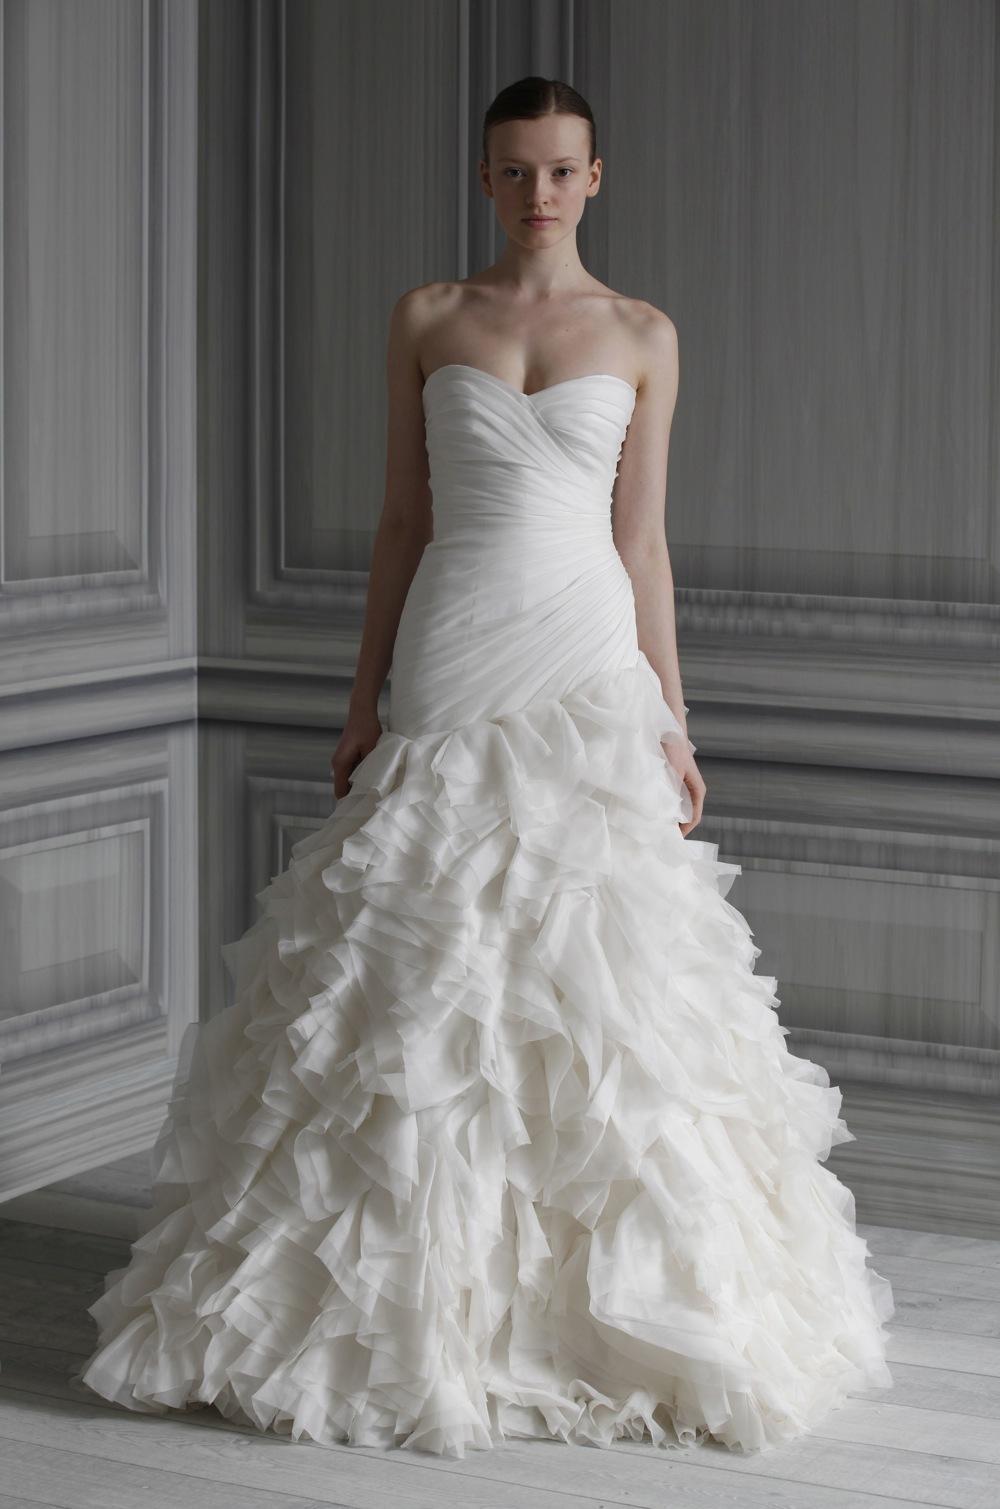 Wedding-dress-monique-lhuillier-bridal-gowns-spring-2012-devotion.full